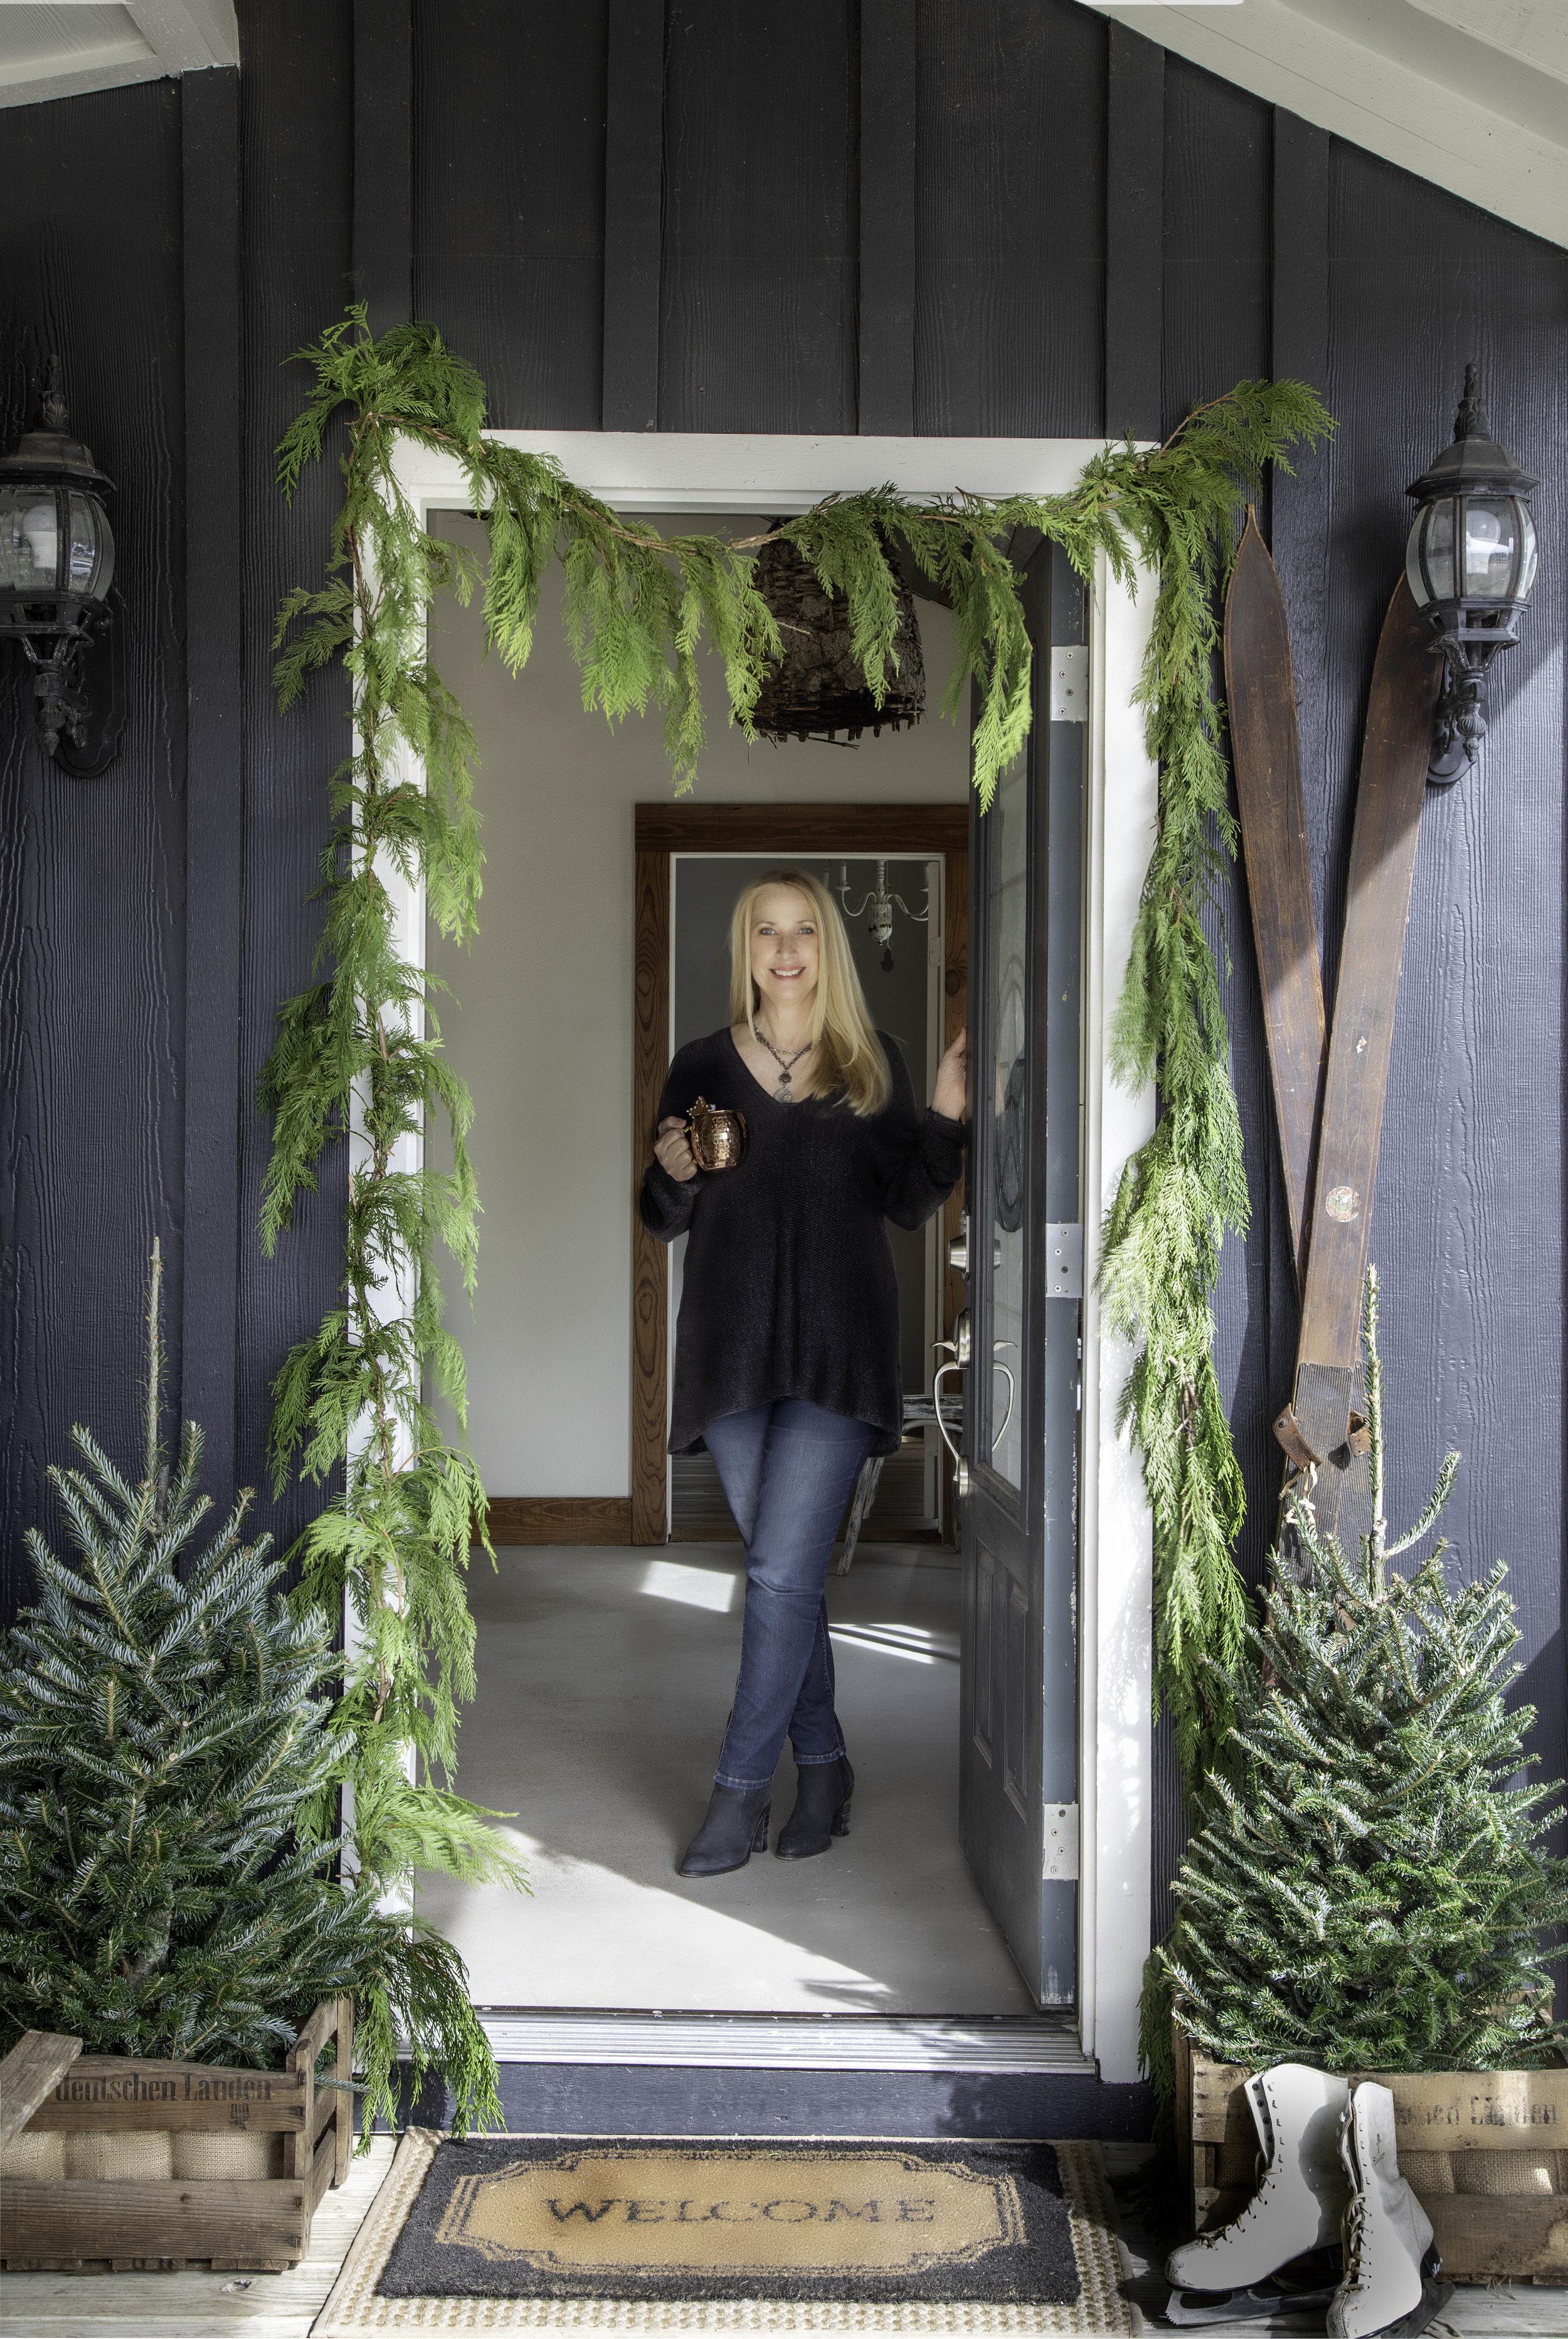 RVT Swedish Christmas. Paige's Blog. Family Heirlooms. Natural holiday decor. Christmas